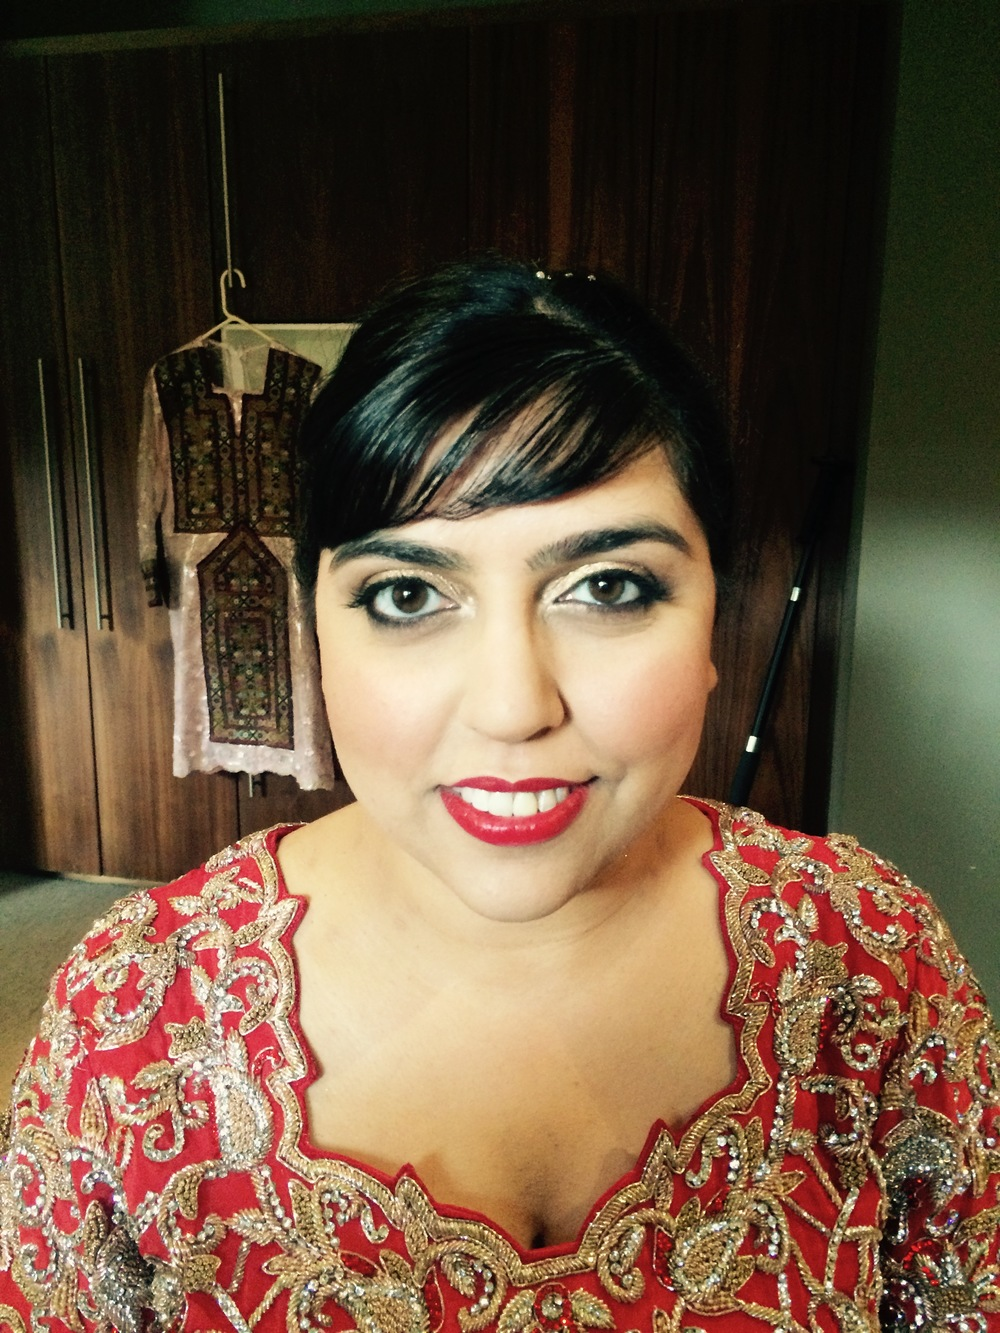 Orchid Blush Hair and Make-Up Blog Orchid Blush Hair ...